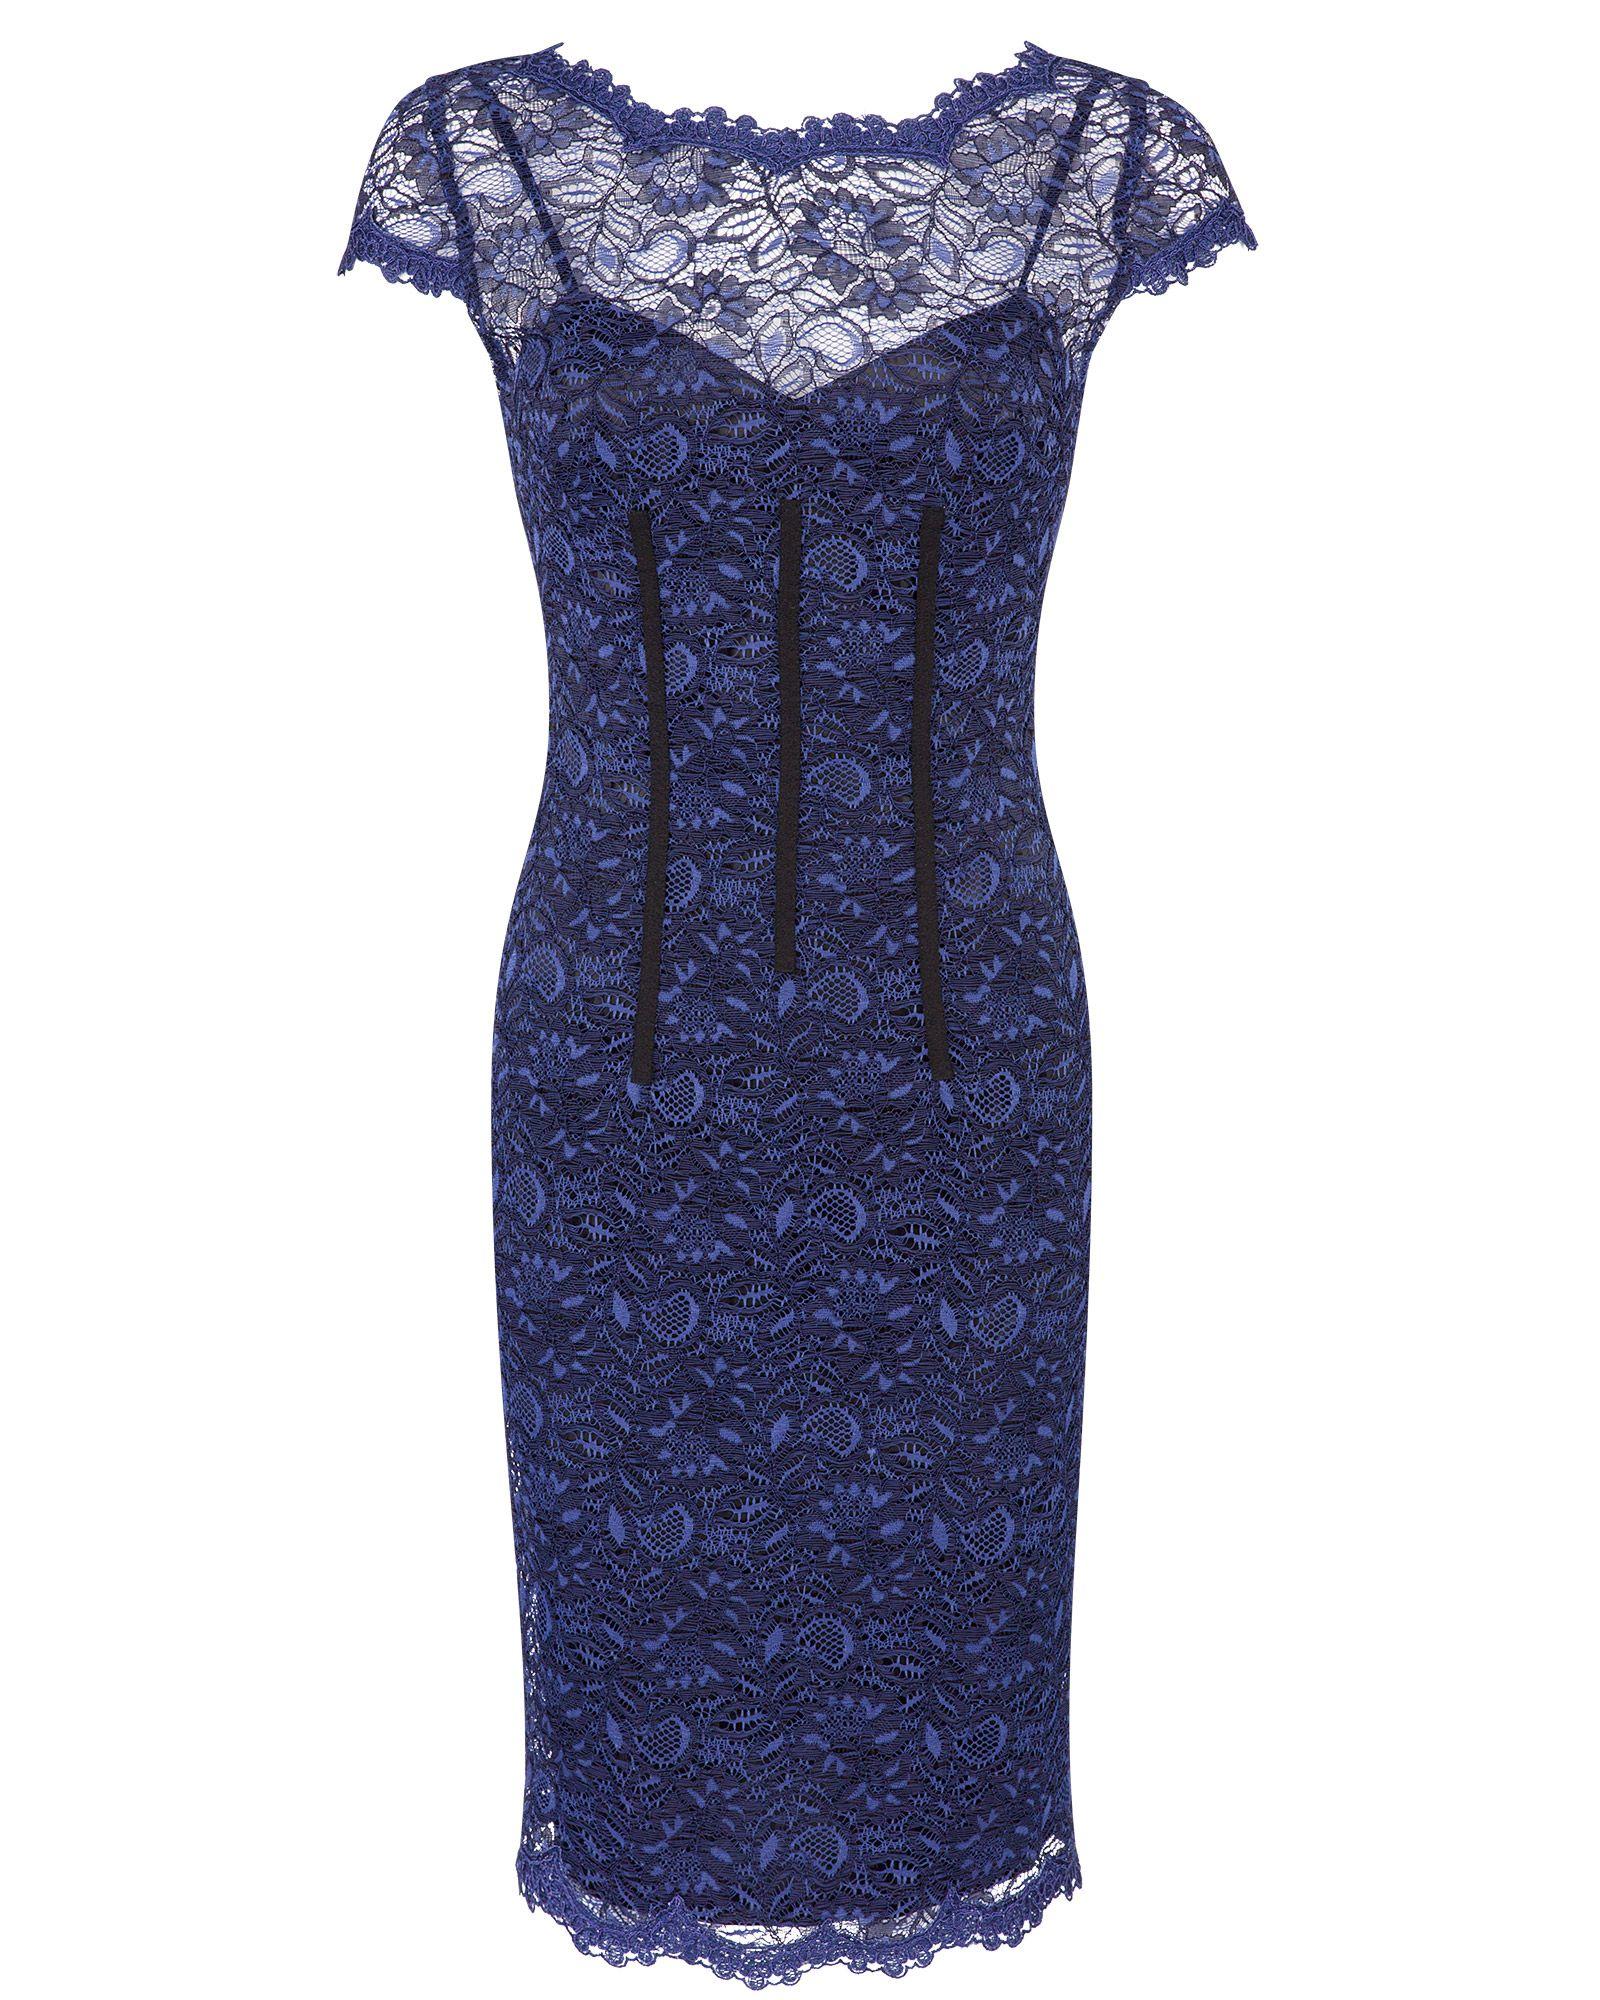 Midnight Stretch Lace Sheath Dress Image 0